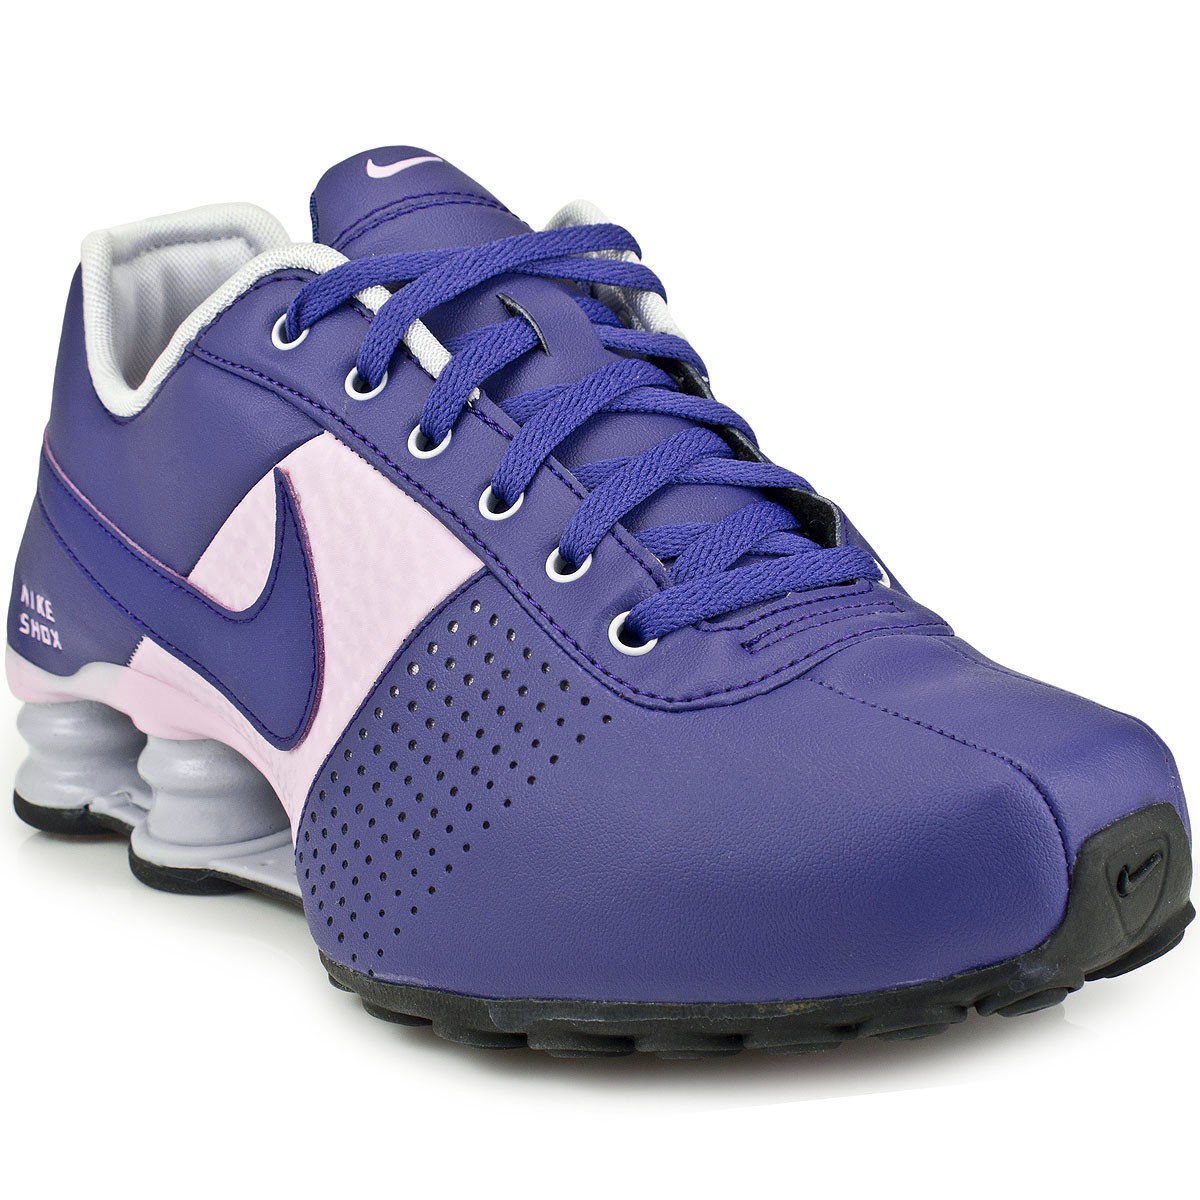 e64e6755ea9 Tênis Nike Shox Deliver W 317549